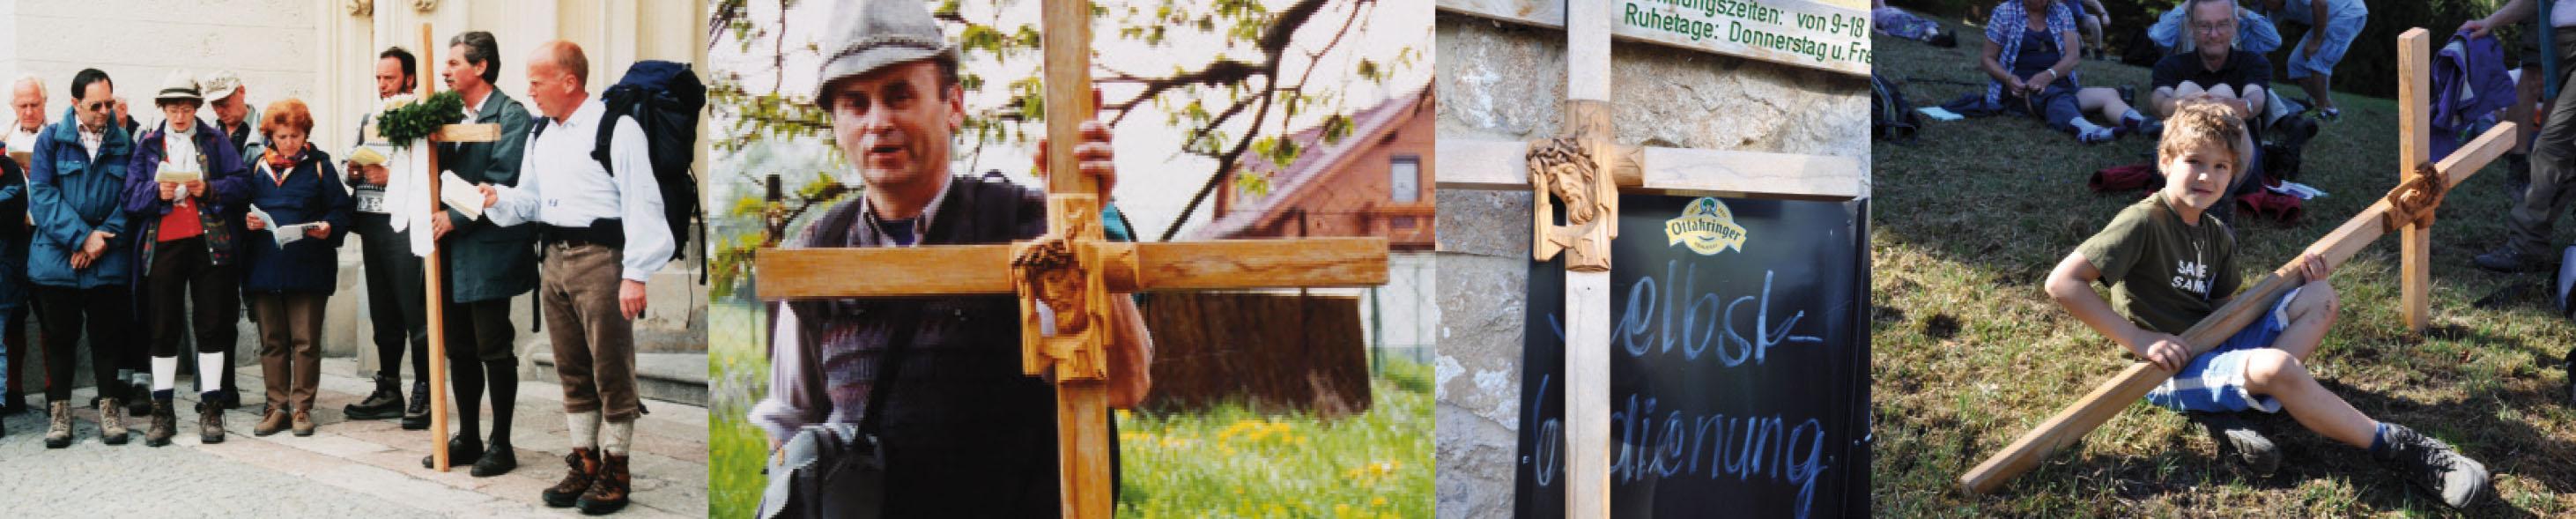 Das Tragekreuz